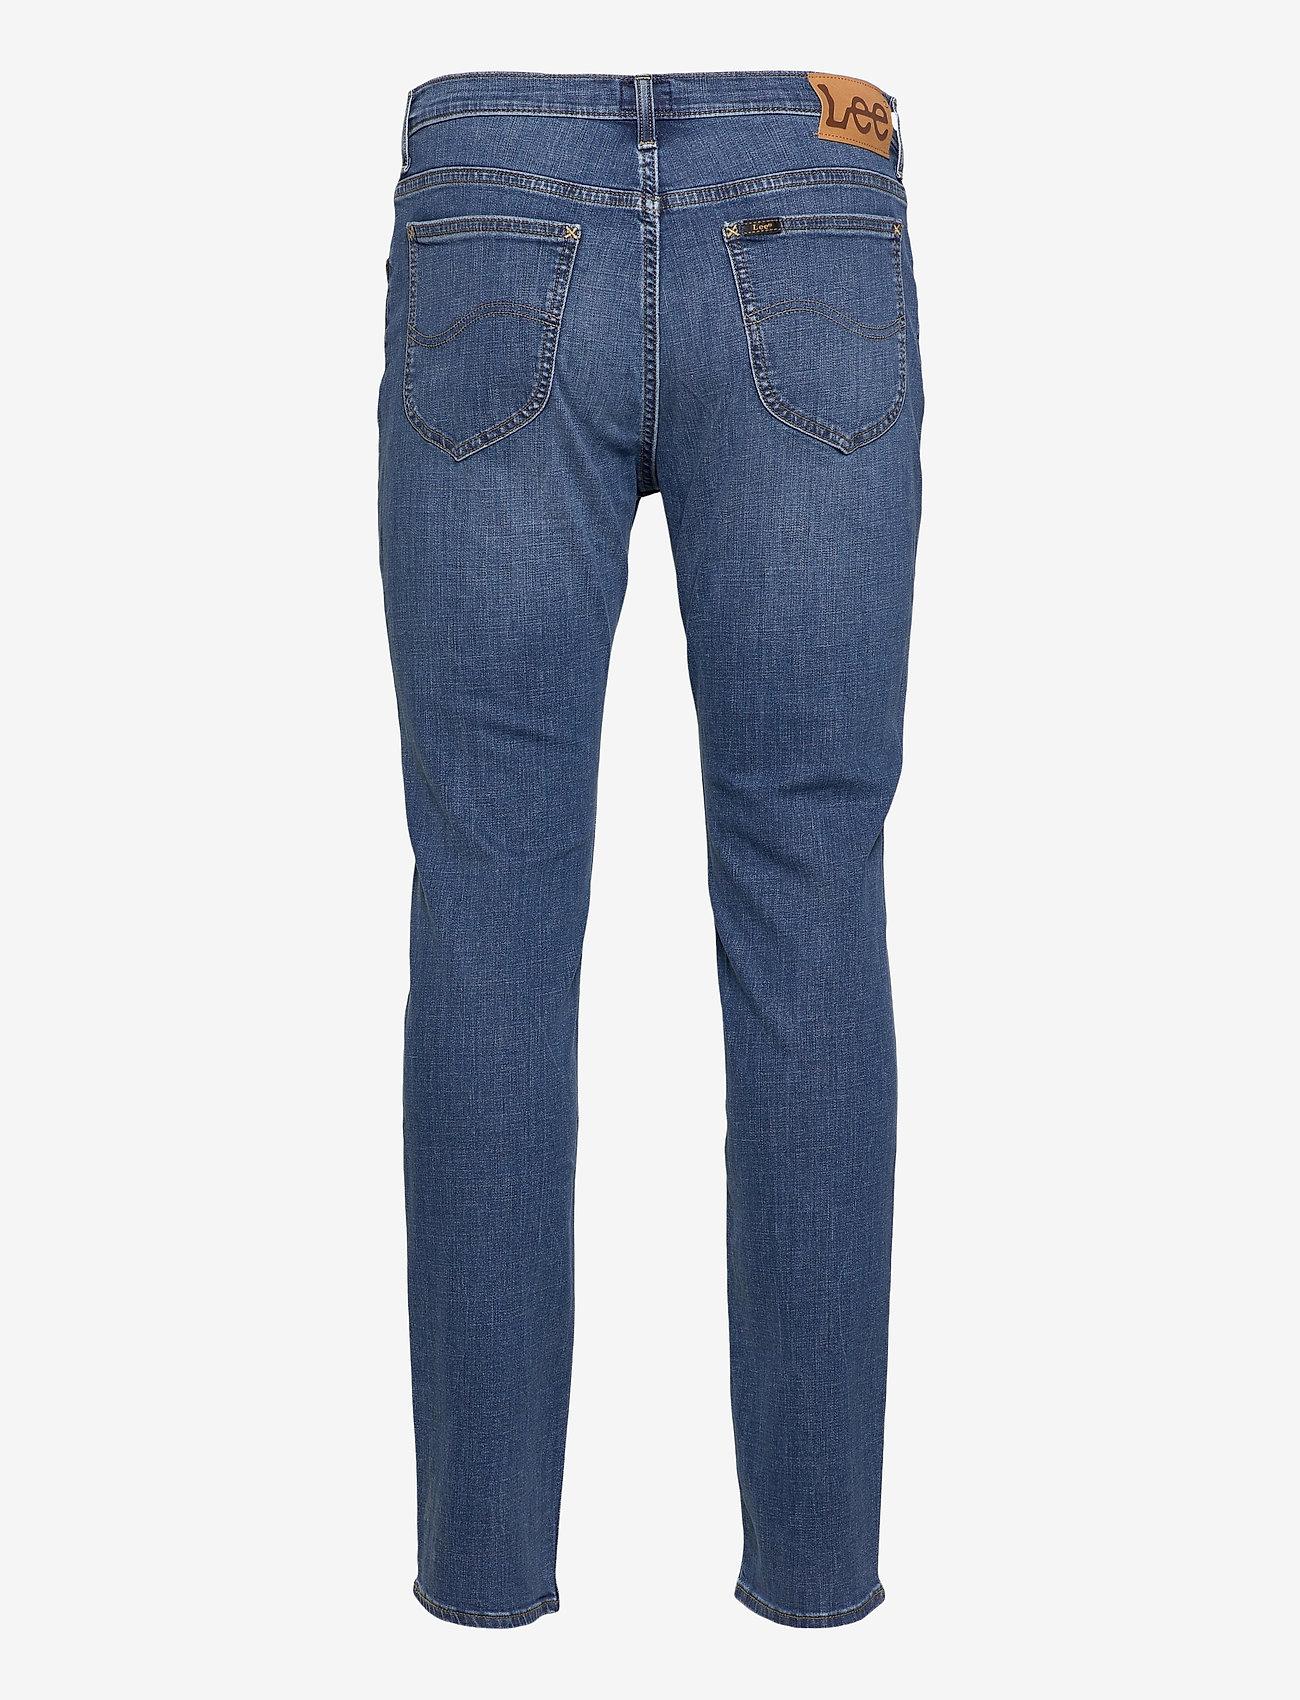 Lee Jeans - RIDER - slim jeans - mid visual cody - 1